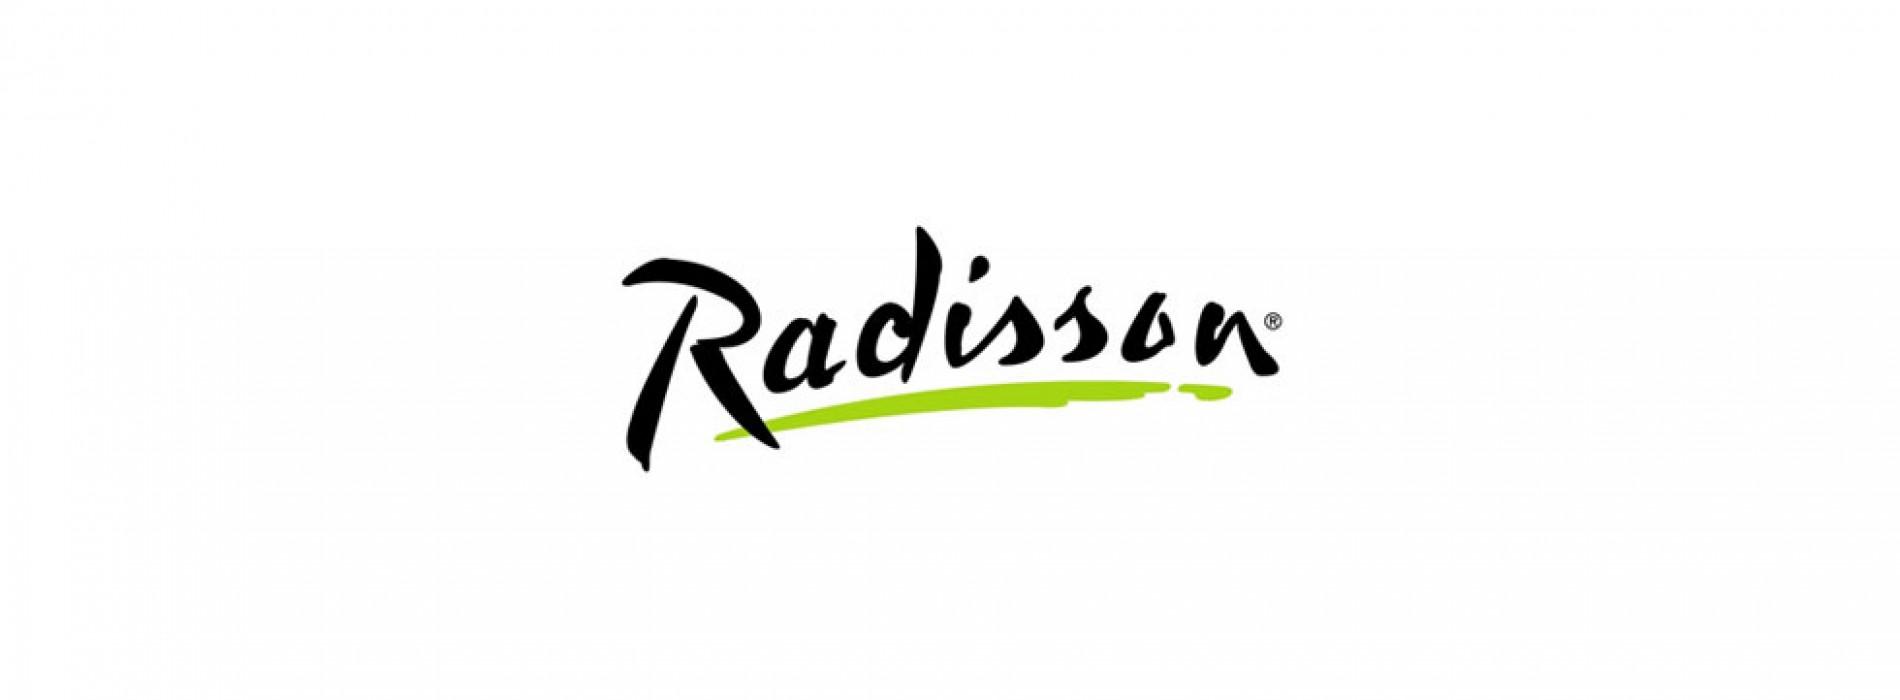 Radisson opens hotel in Cromwell